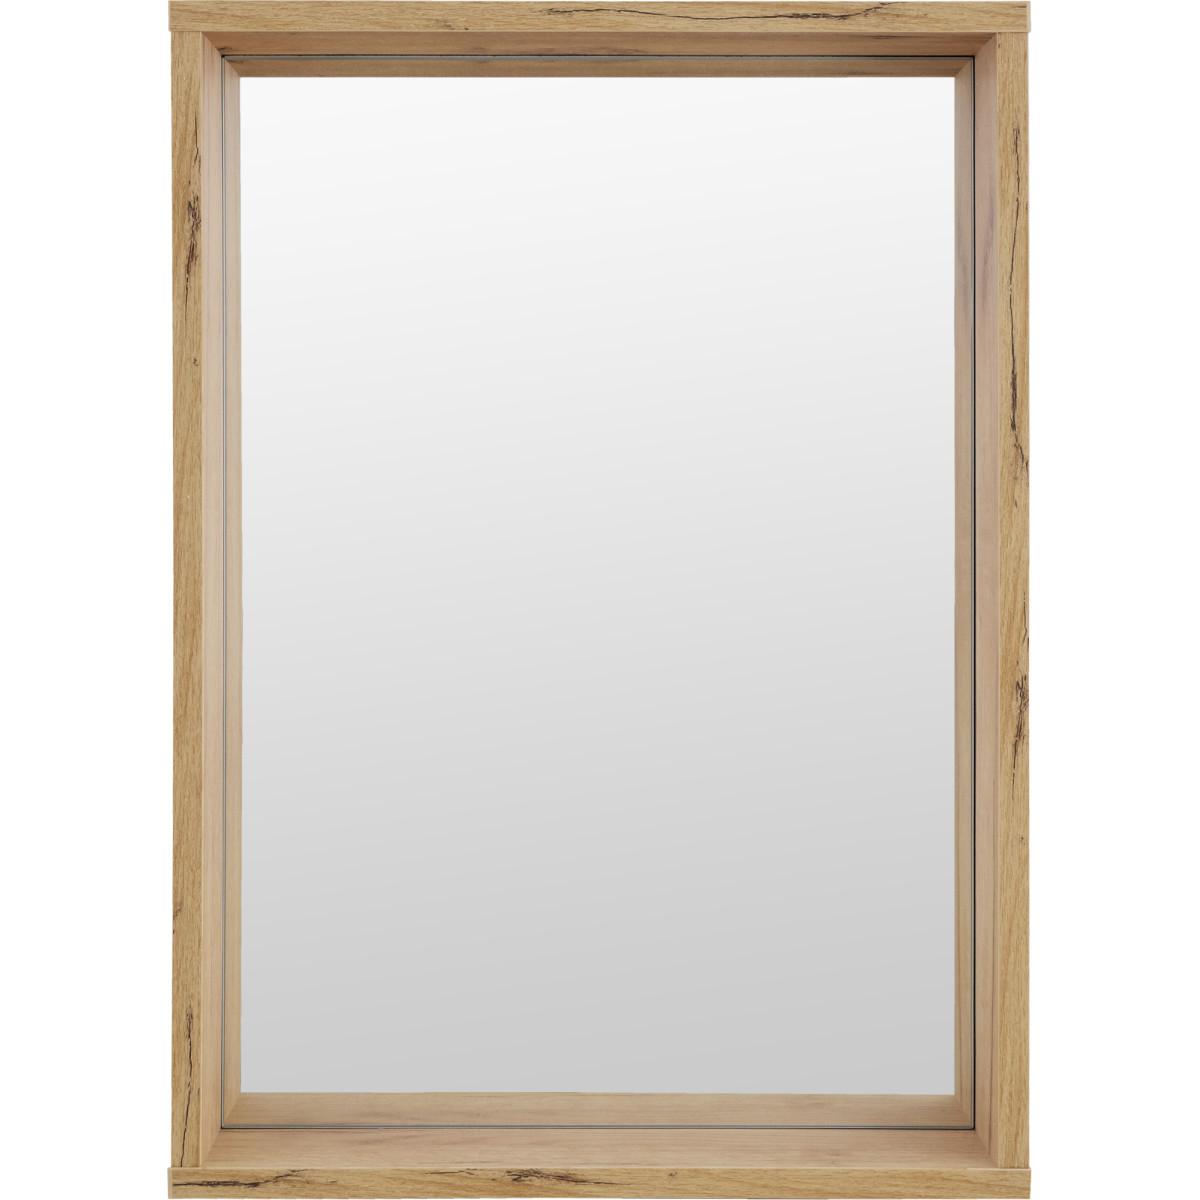 Зеркало Лофт 50 см